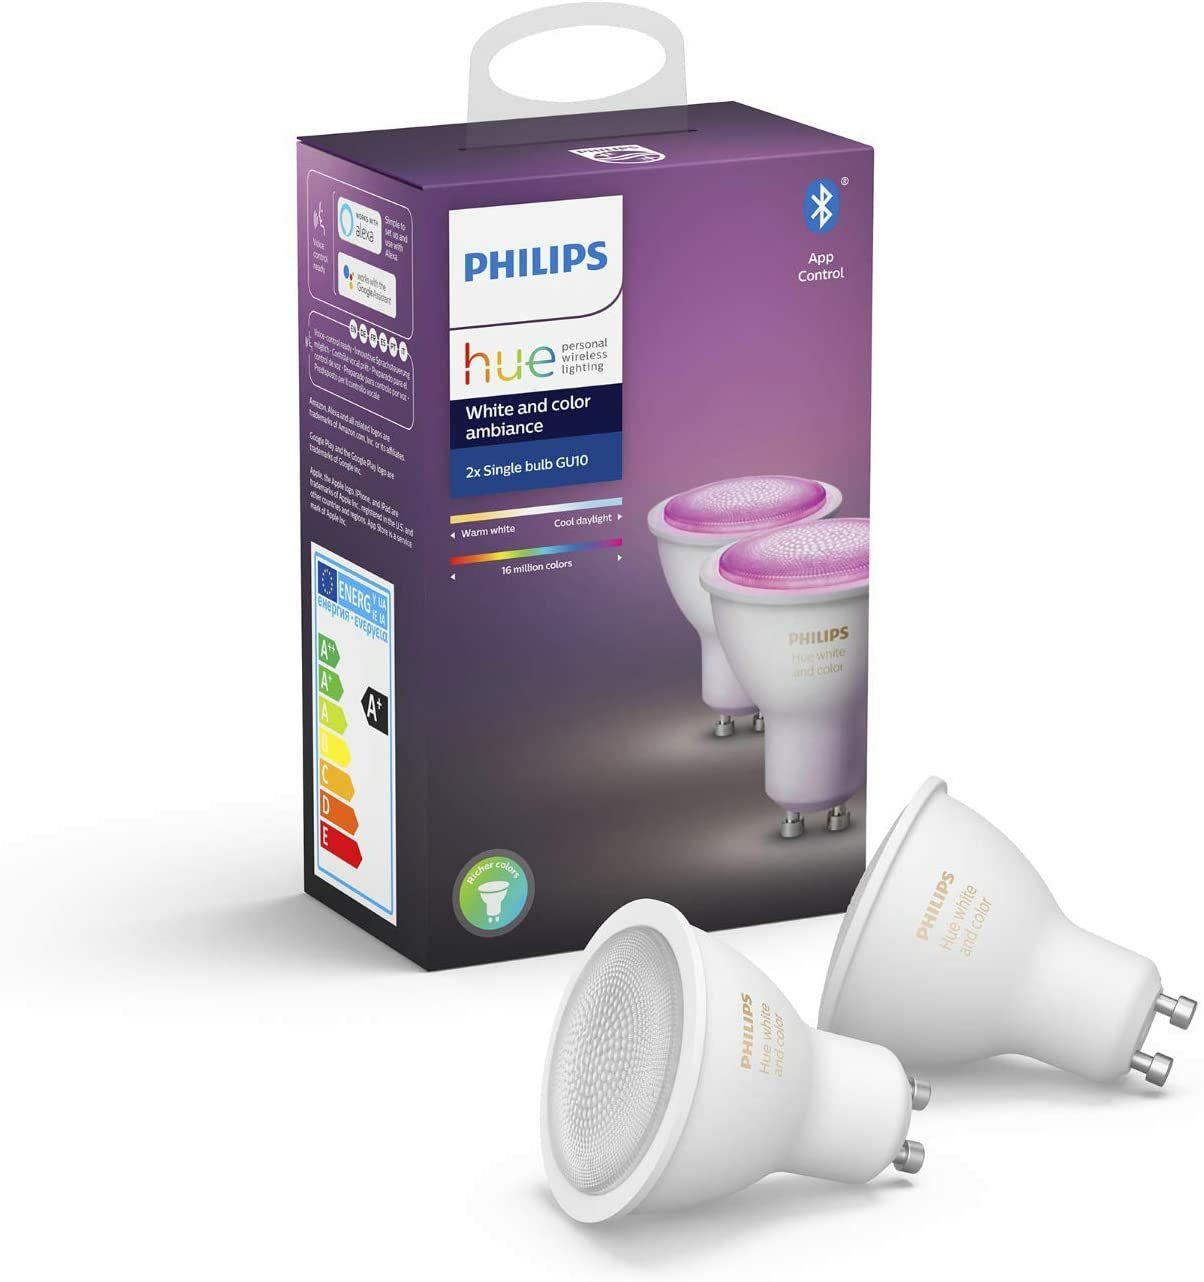 Philips Hue 2er-Set GU10 White & Color Ambiance